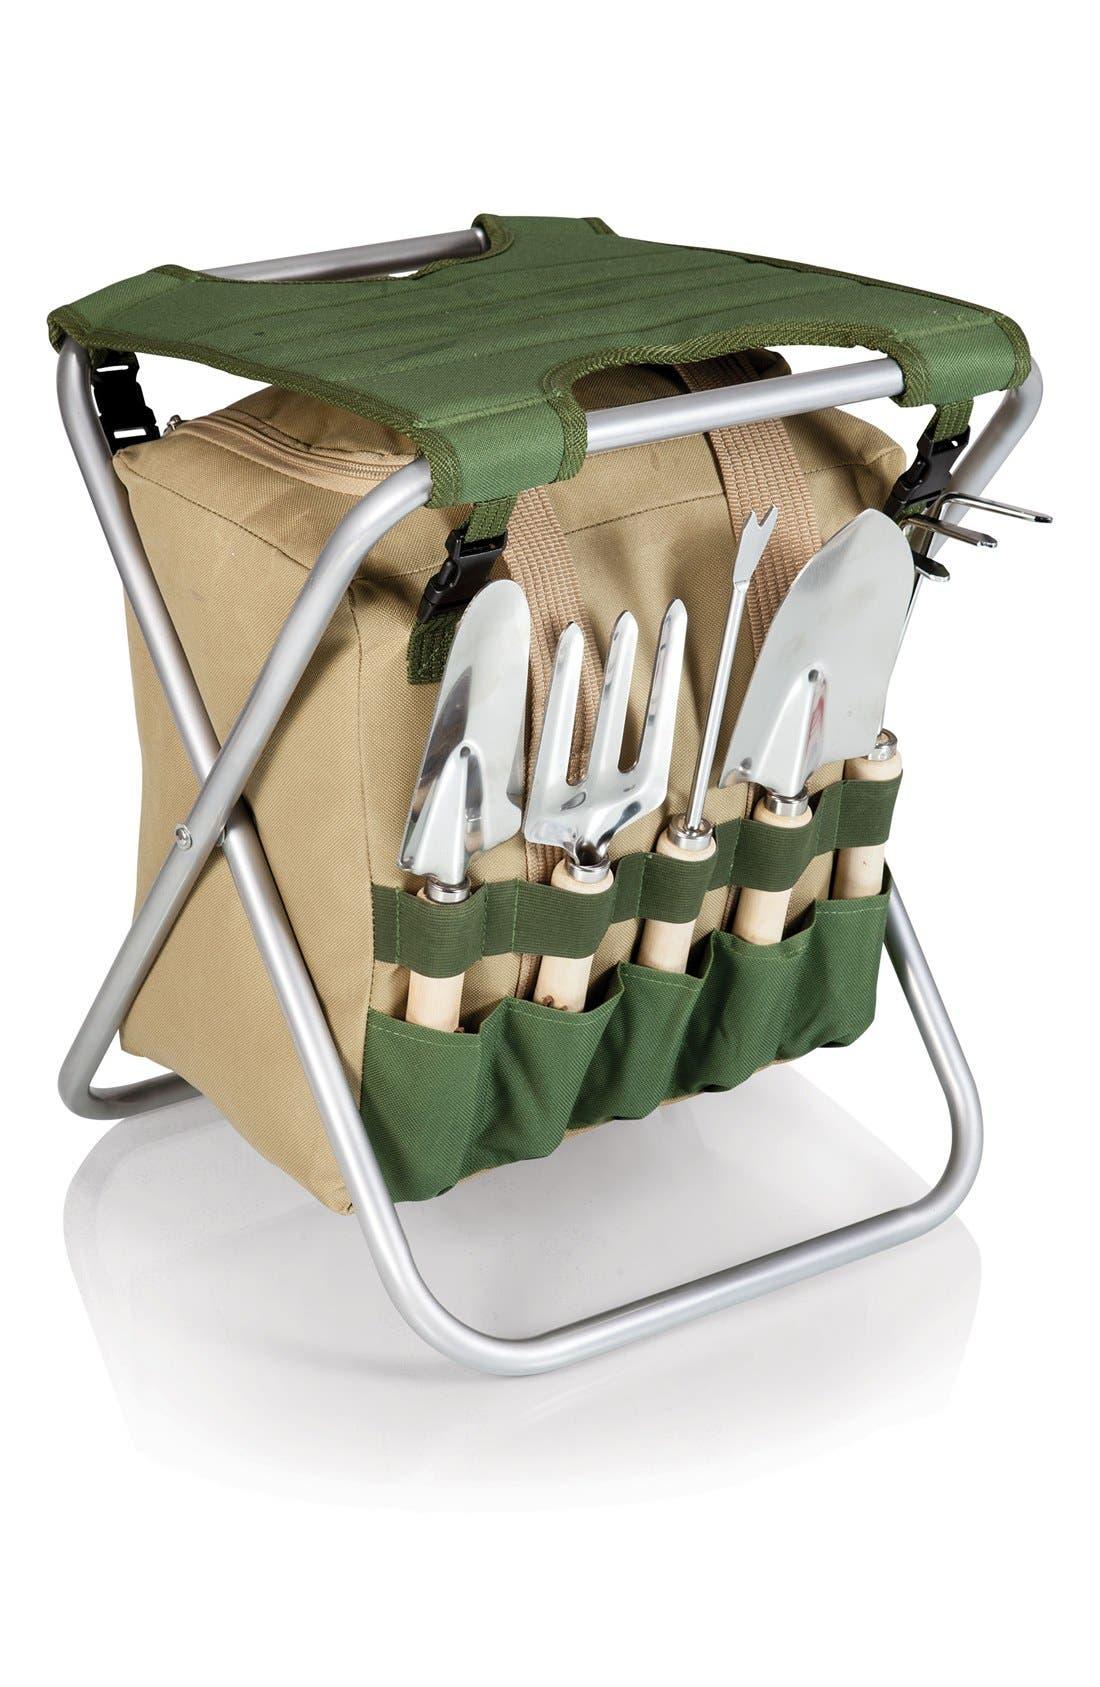 Main Image - Picnic Time Gardener Seat & Tools